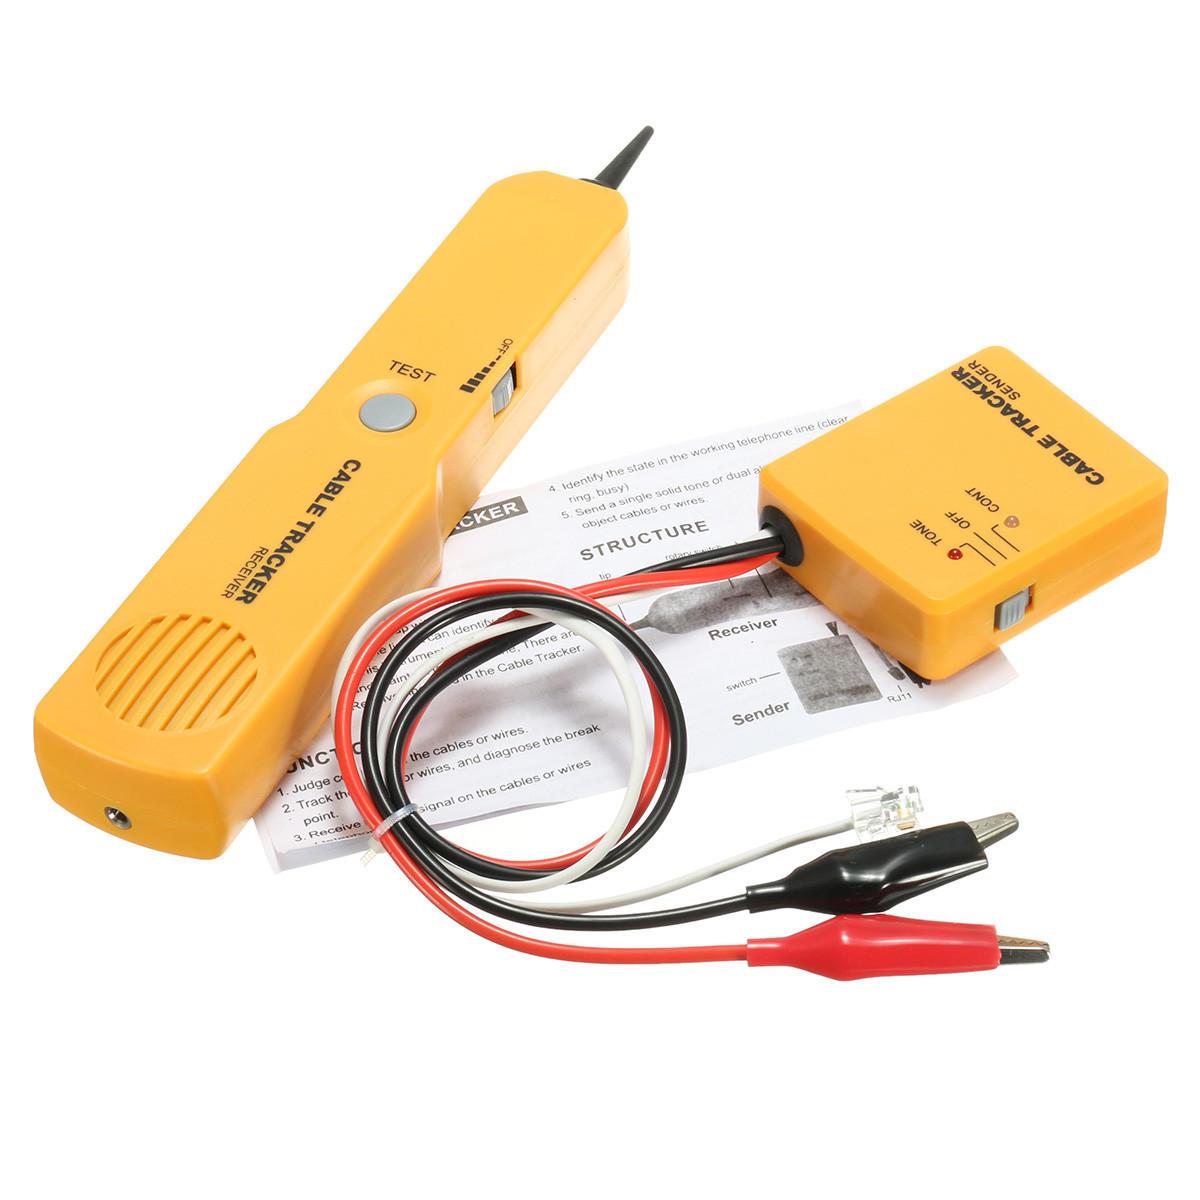 hight resolution of telephone line finder rj11 wire tracker network break short circuit tester cod